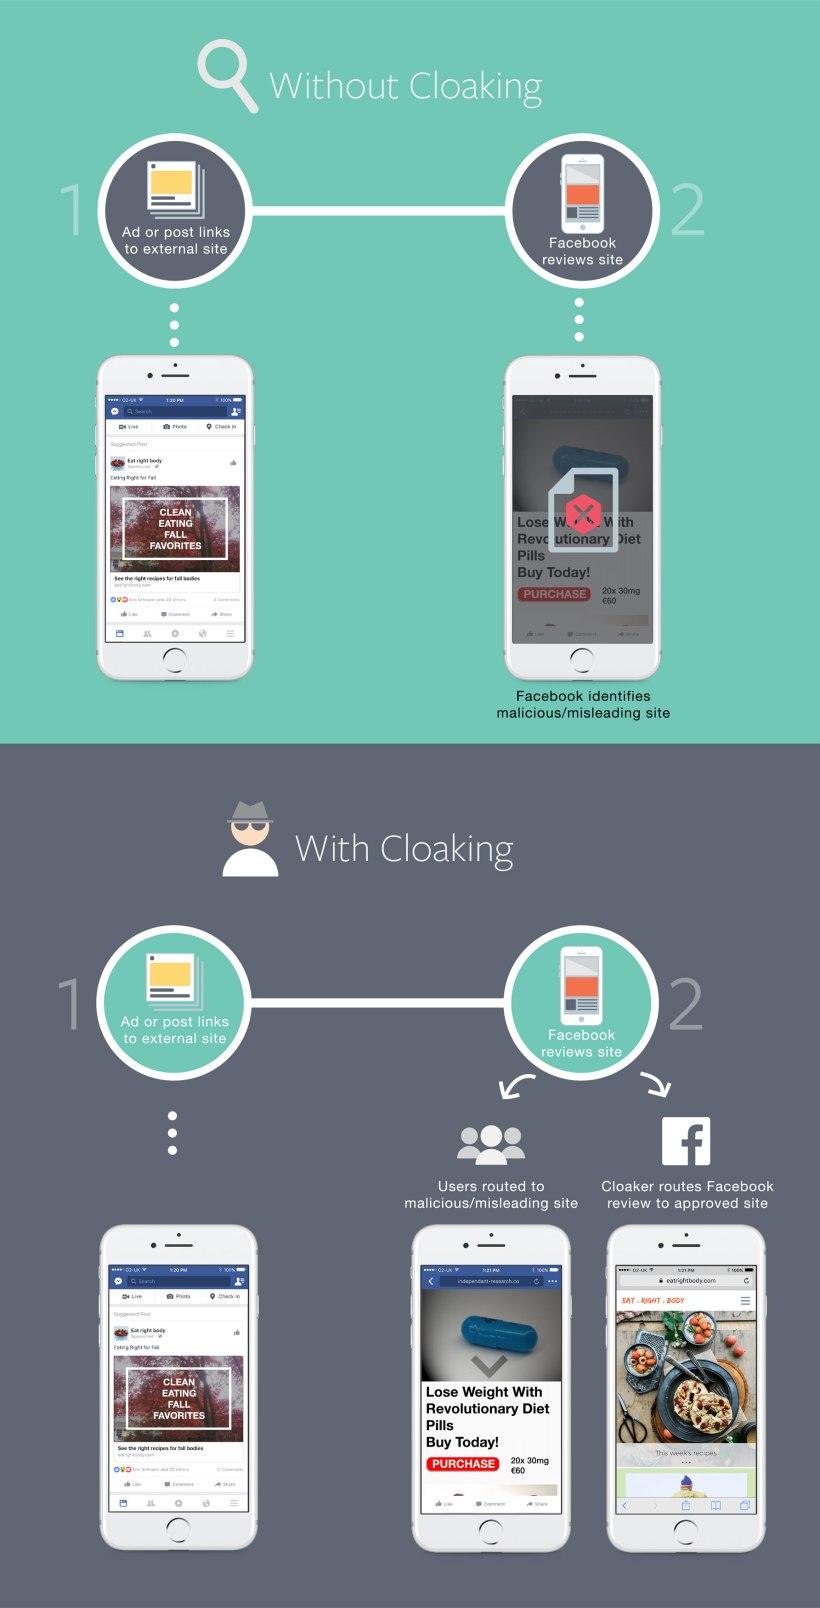 wersm-facebook-cloaking_inlinegraphics